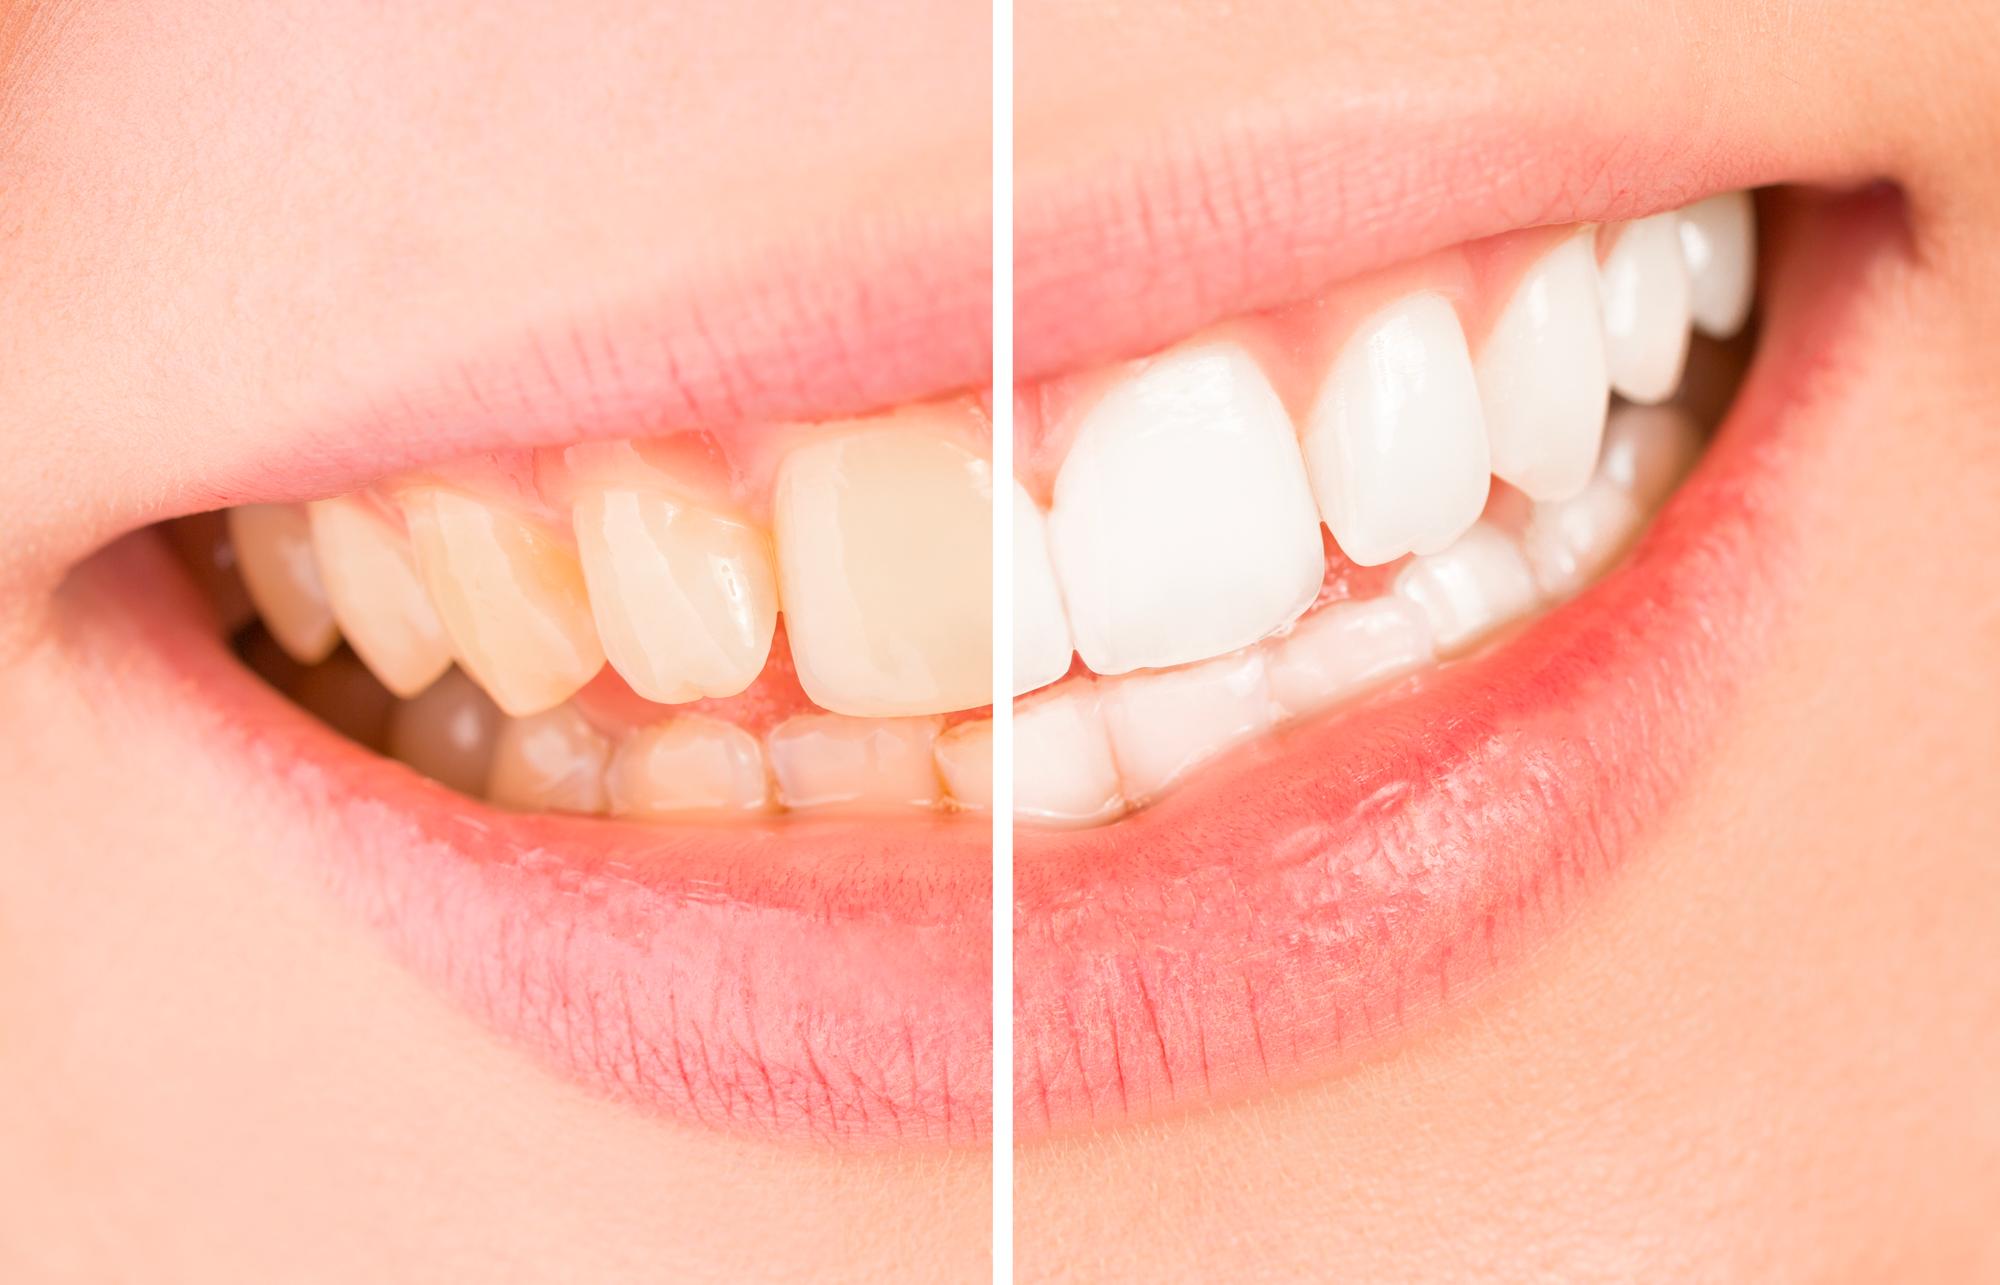 Sbiancamento Dentale a Brescia